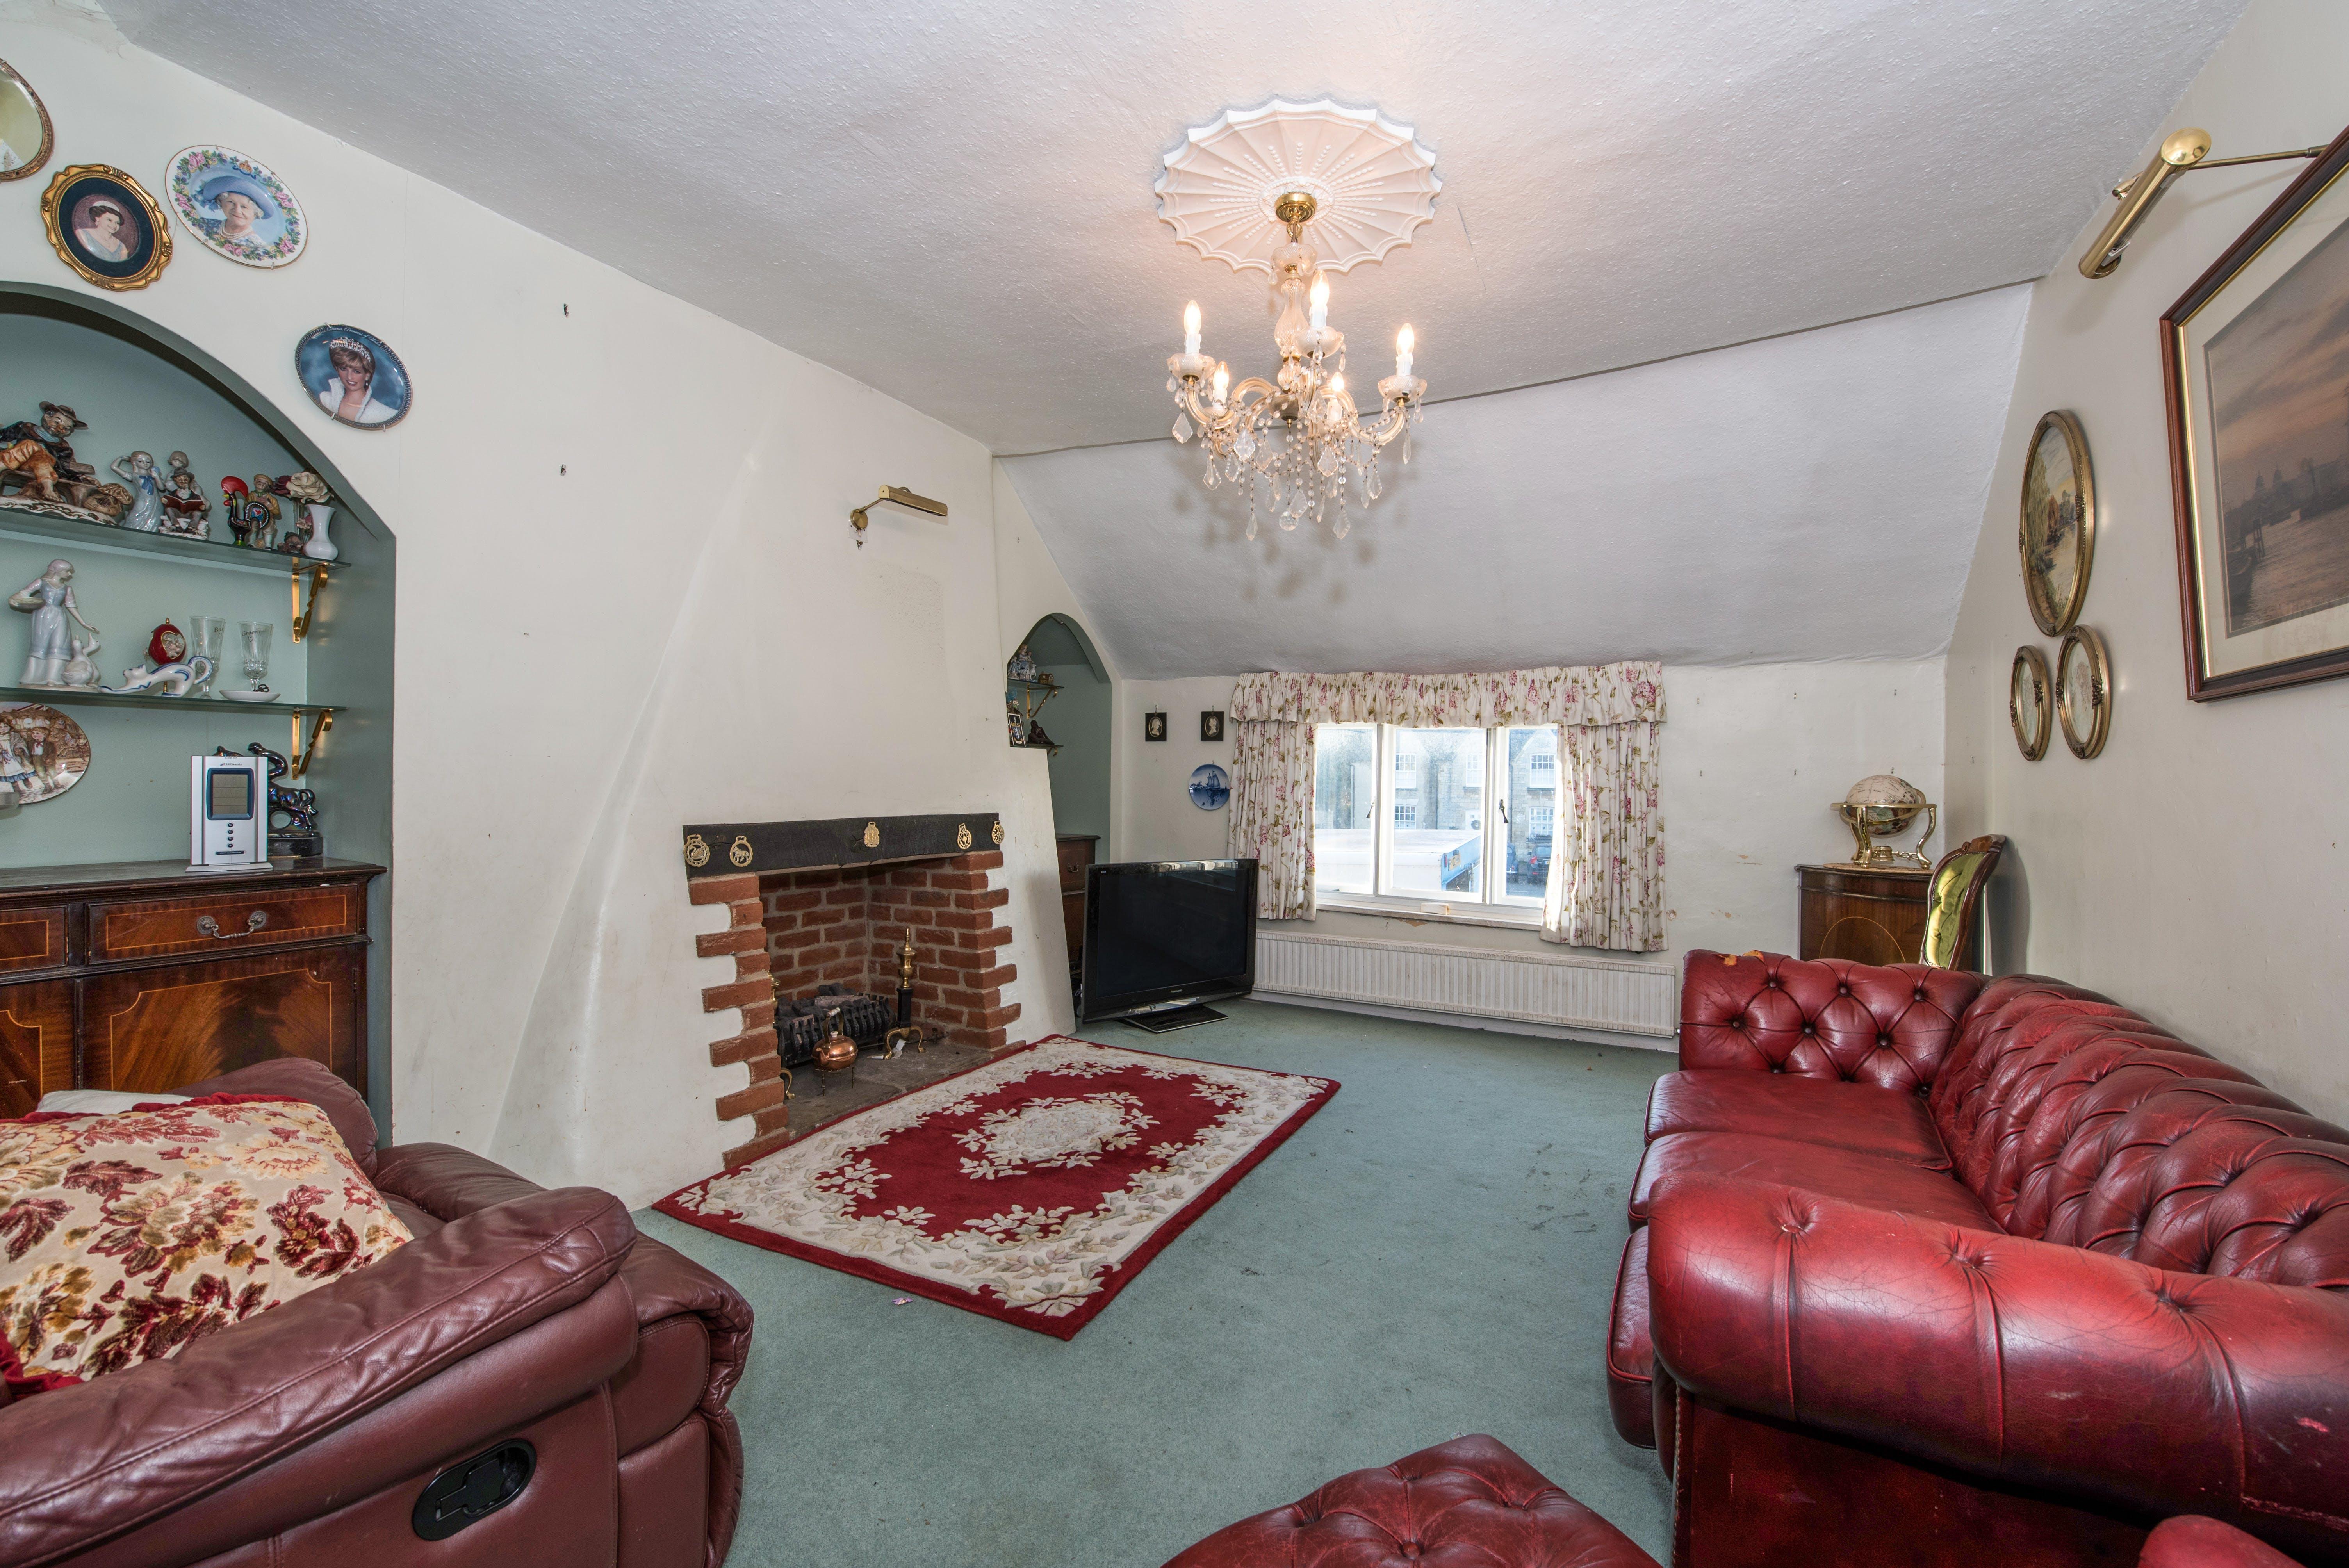 18-20 Upper High Street, Thame, Retail / Residential / Investment For Sale - Fields01.jpg